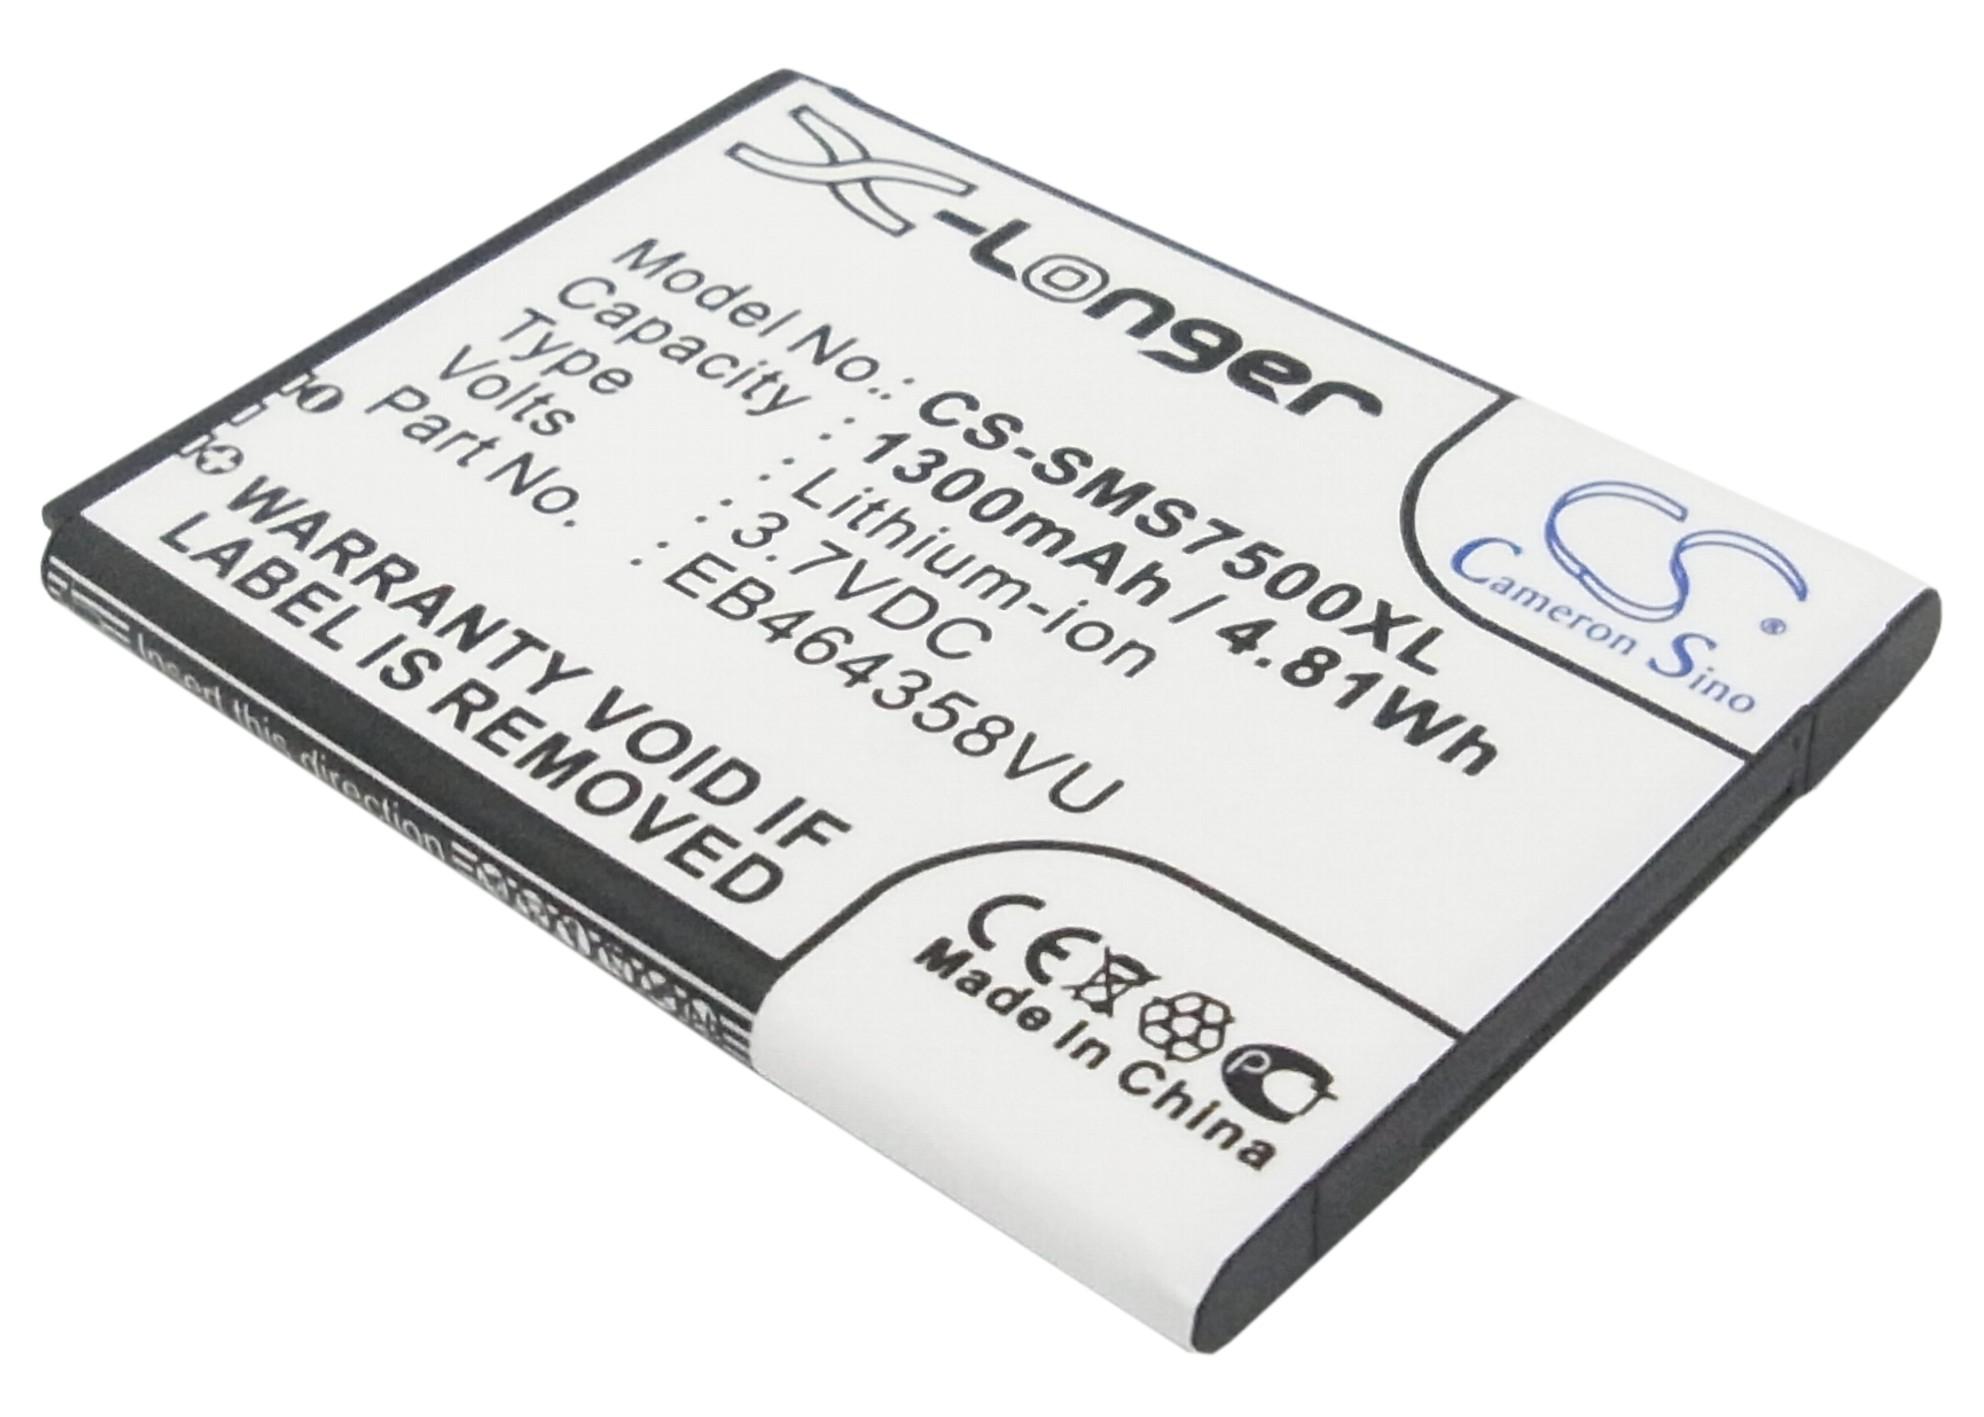 Cameron Sino baterie do mobilů pro SAMSUNG GT-S6312 3.7V Li-ion 1300mAh černá - neoriginální